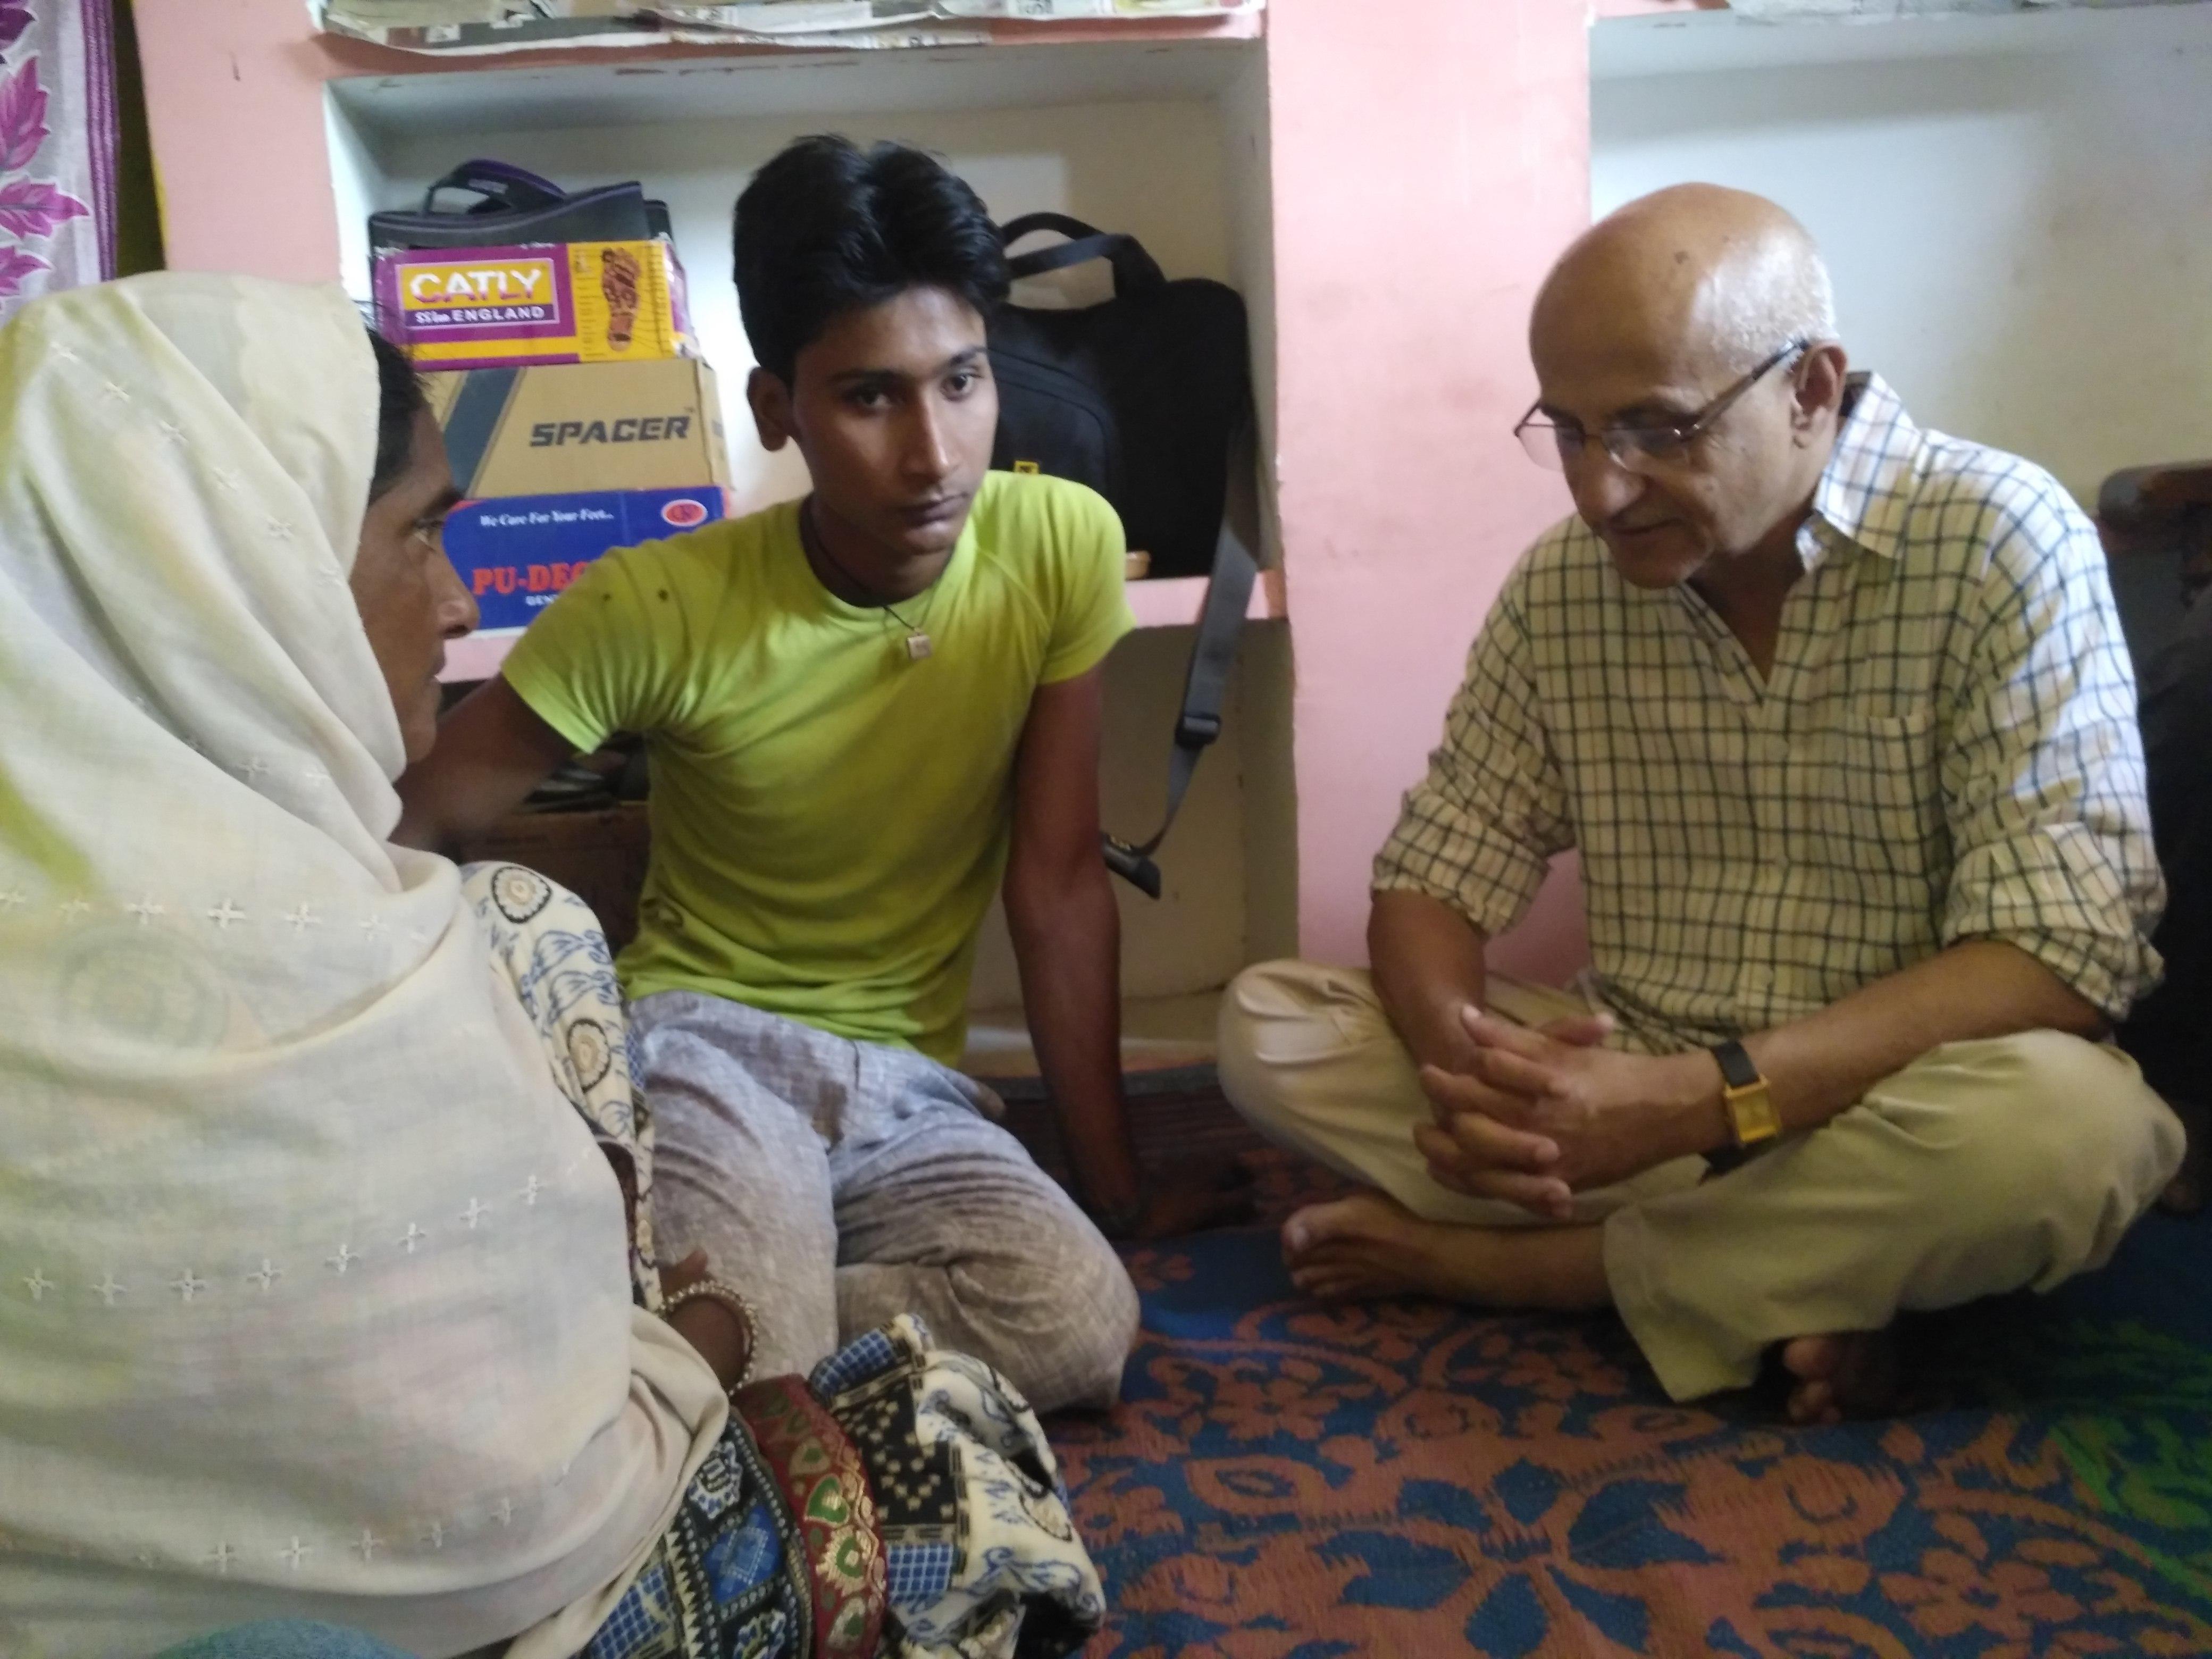 With Amiluddin Ansari's widow Mariam Khatoon and son Shahban. (Credit: Ashraful Hussain)